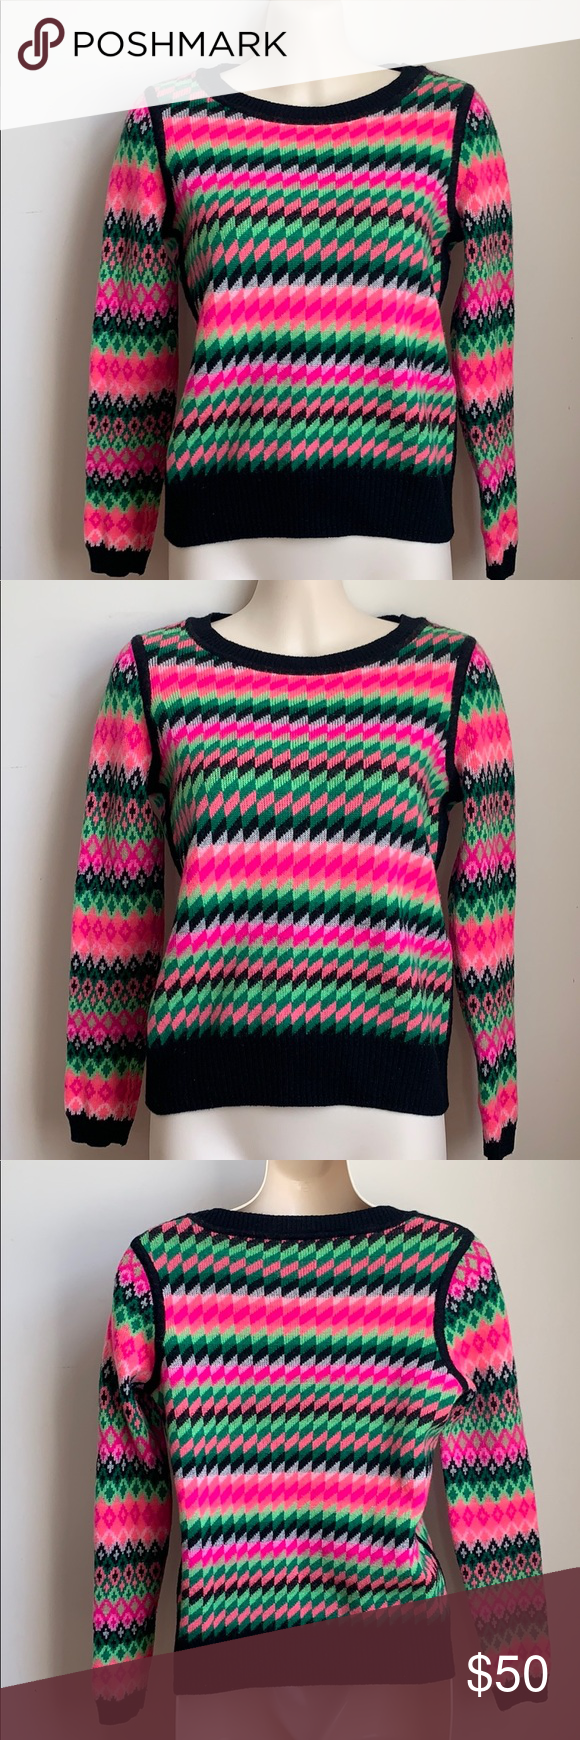 Milly Reversible Wool Kuji Sweater NWOT Small | Sweaters